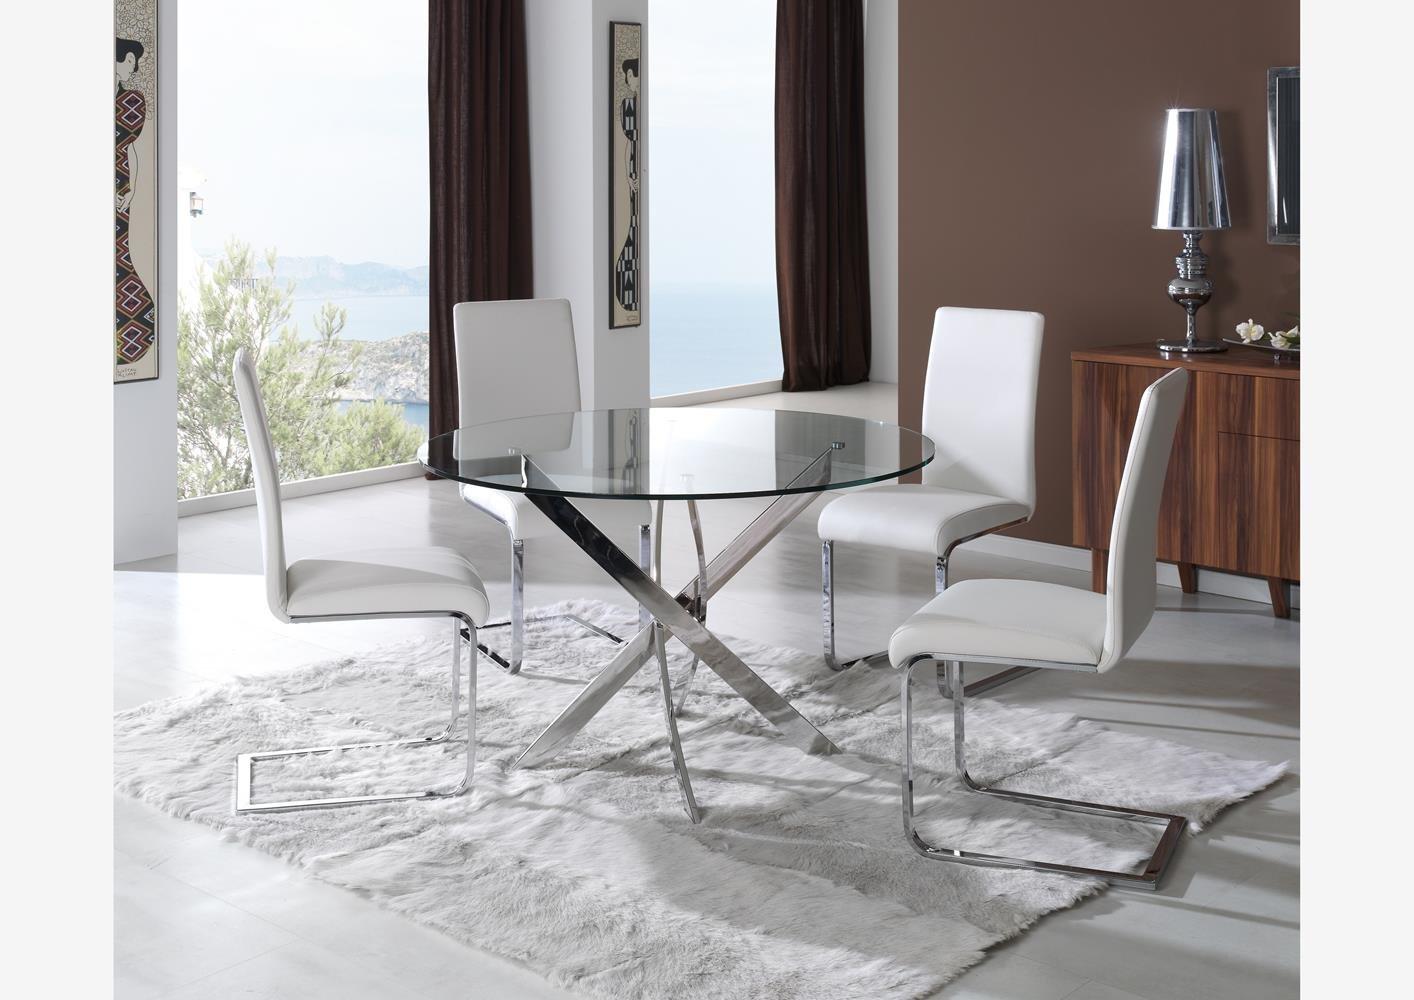 10 mesas redondas de cristal para tu hogar decoraci n del - Mesa redonda de cristal ...